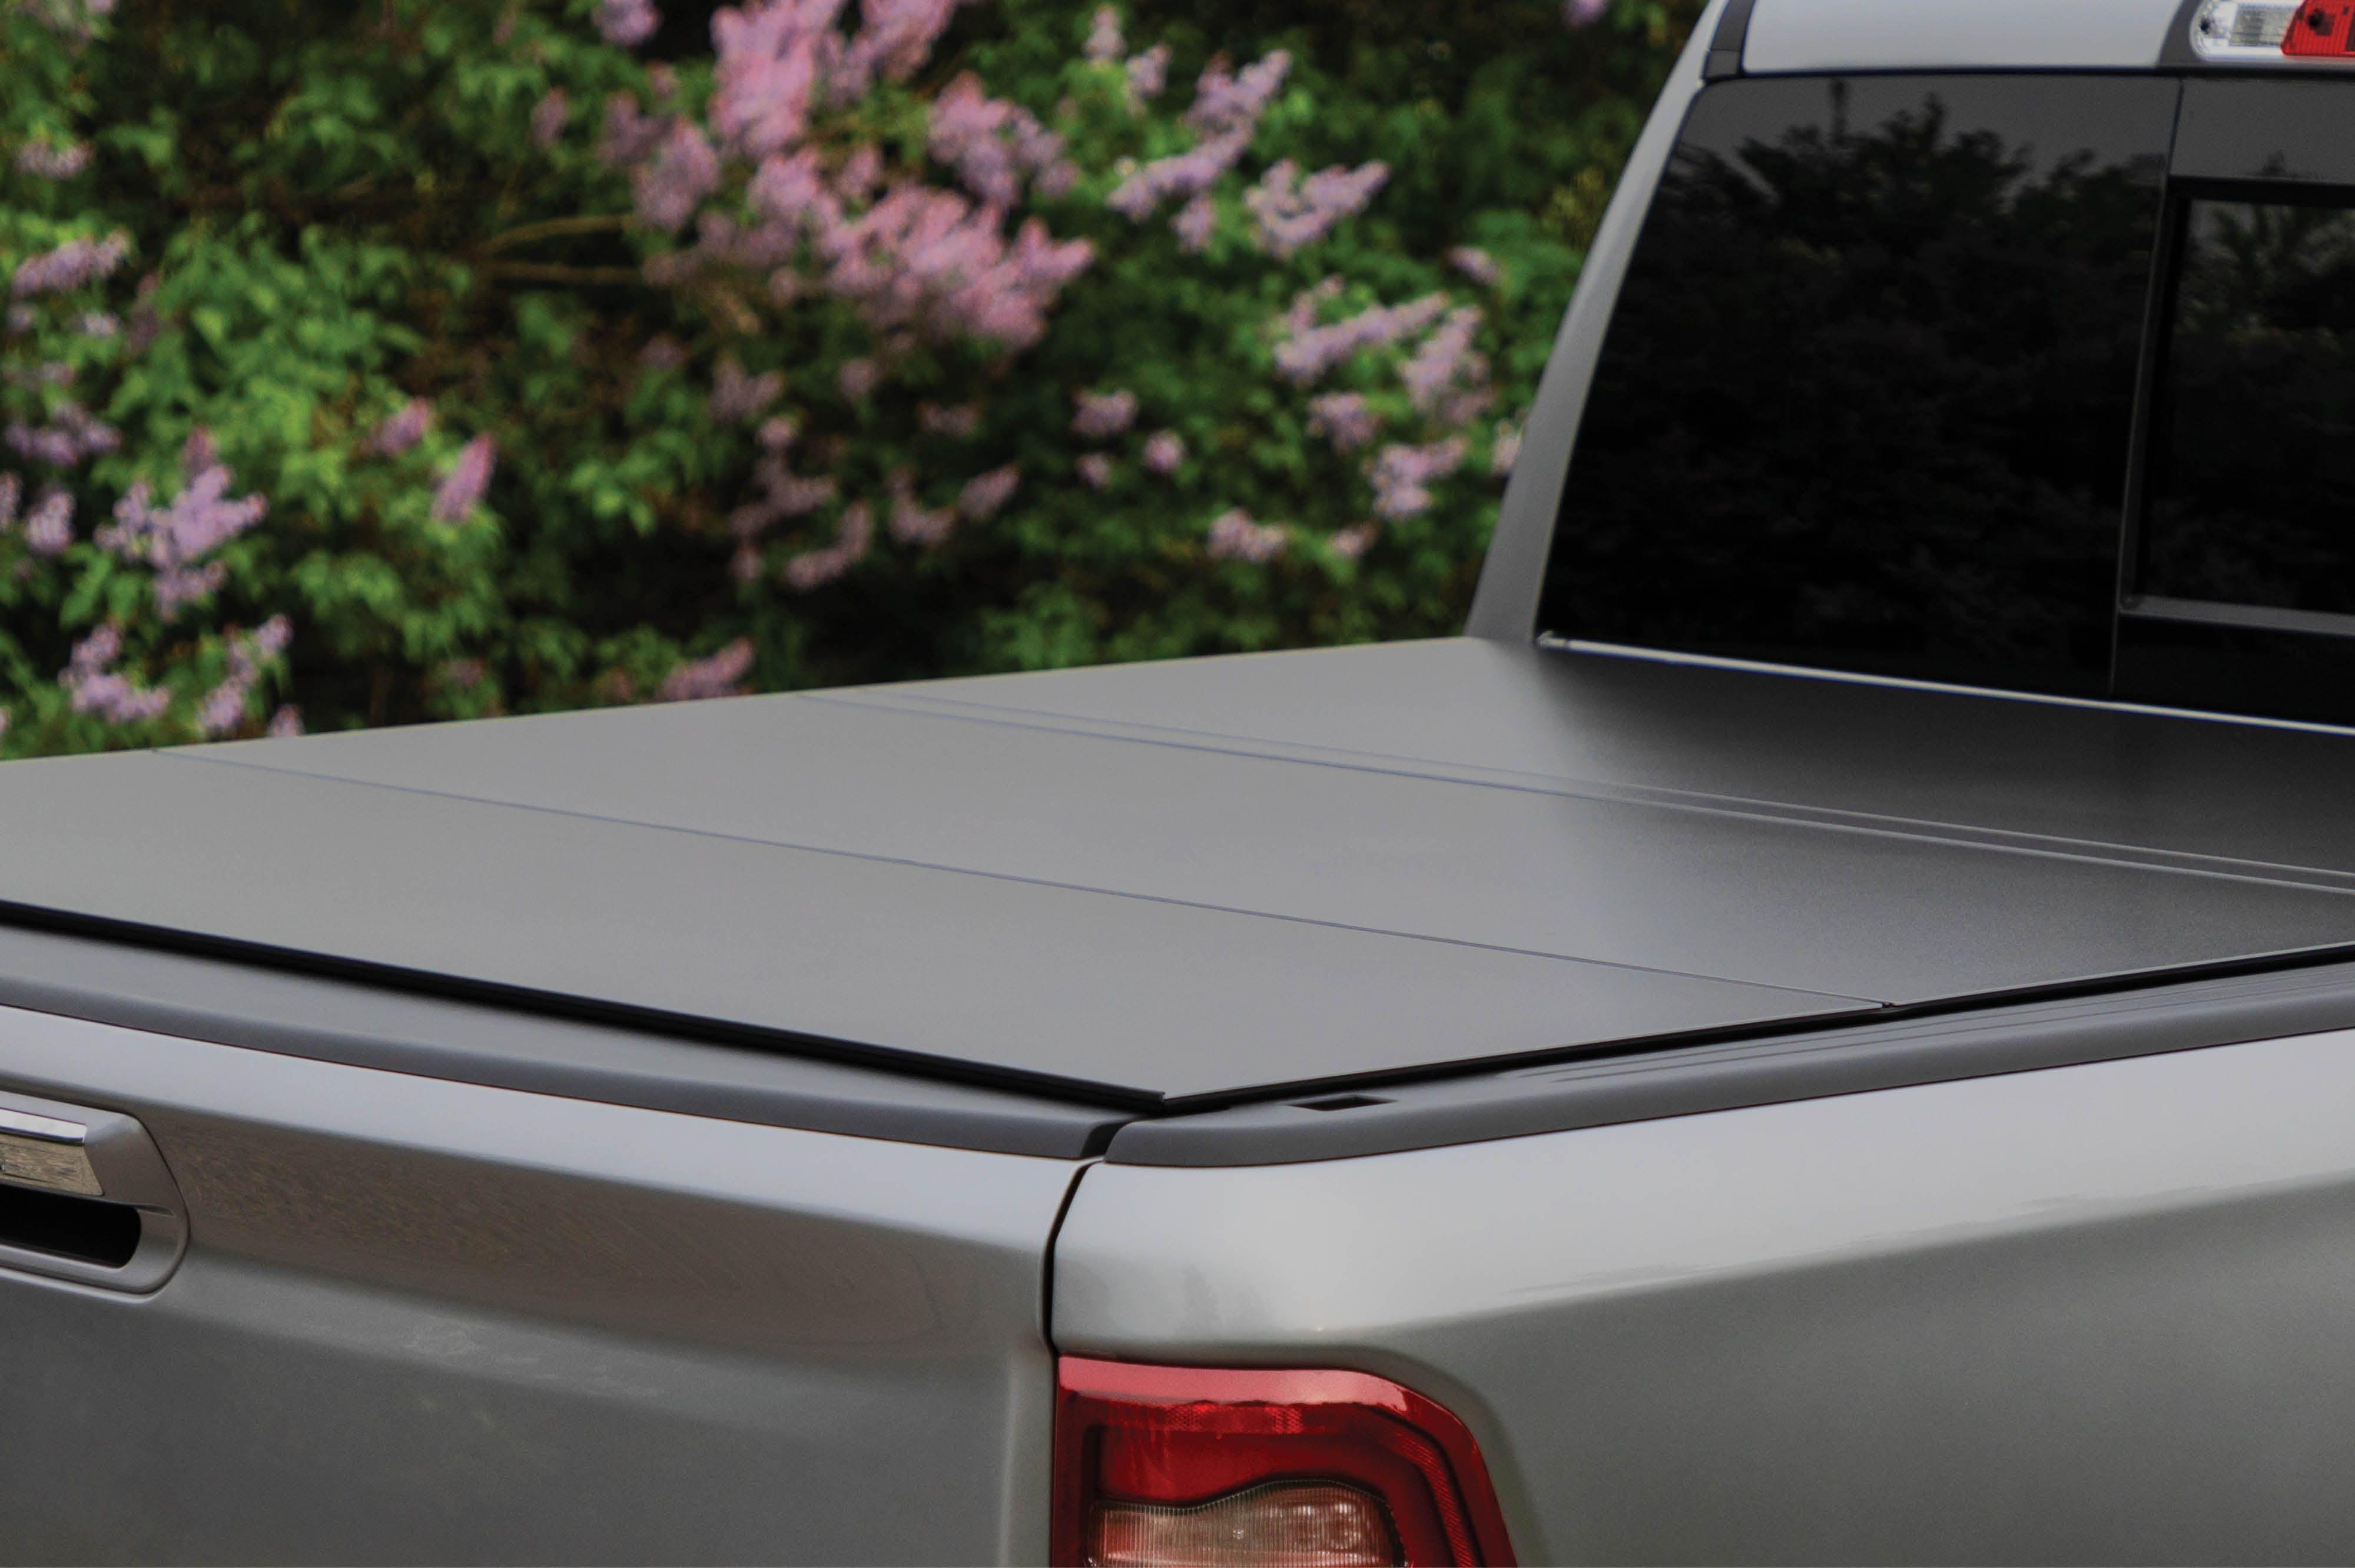 Higher Standard Lower Profile Lomax Hard Tri Fold Cover